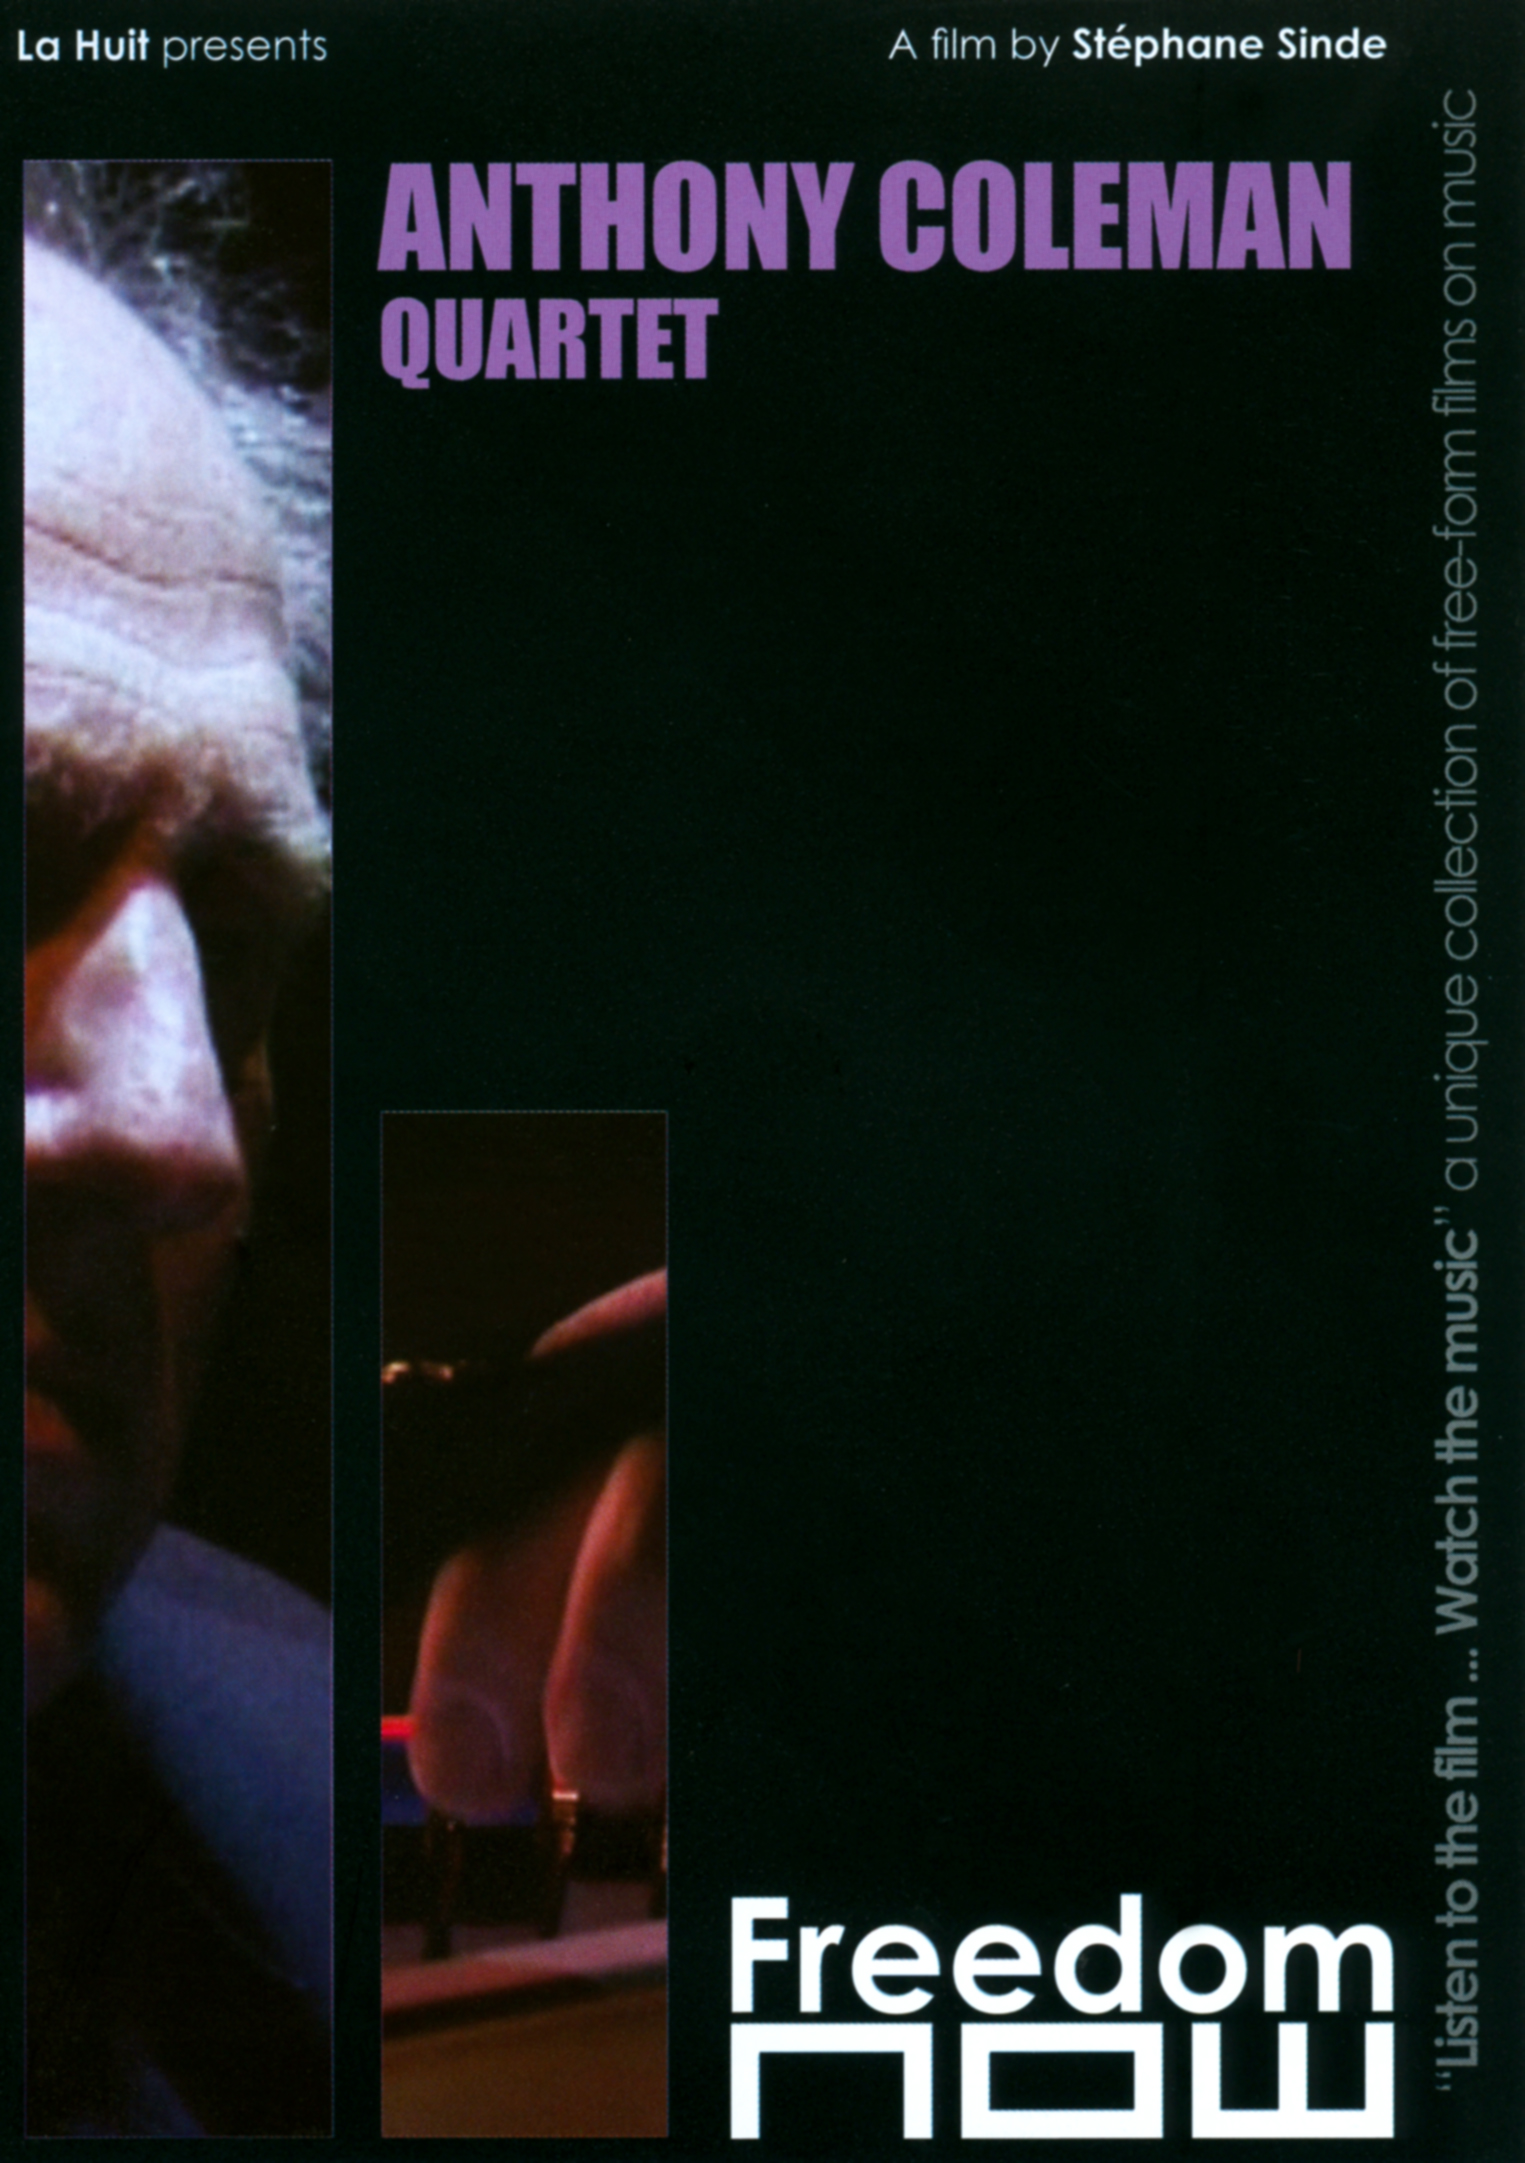 Anthony Coleman Quartet